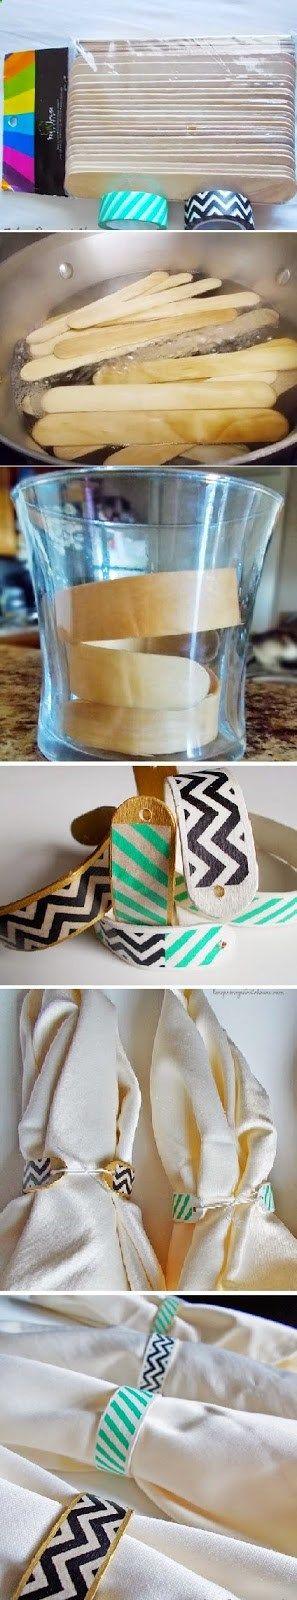 Hair Clips - diy crafts: Washi Tape Napkin Rings